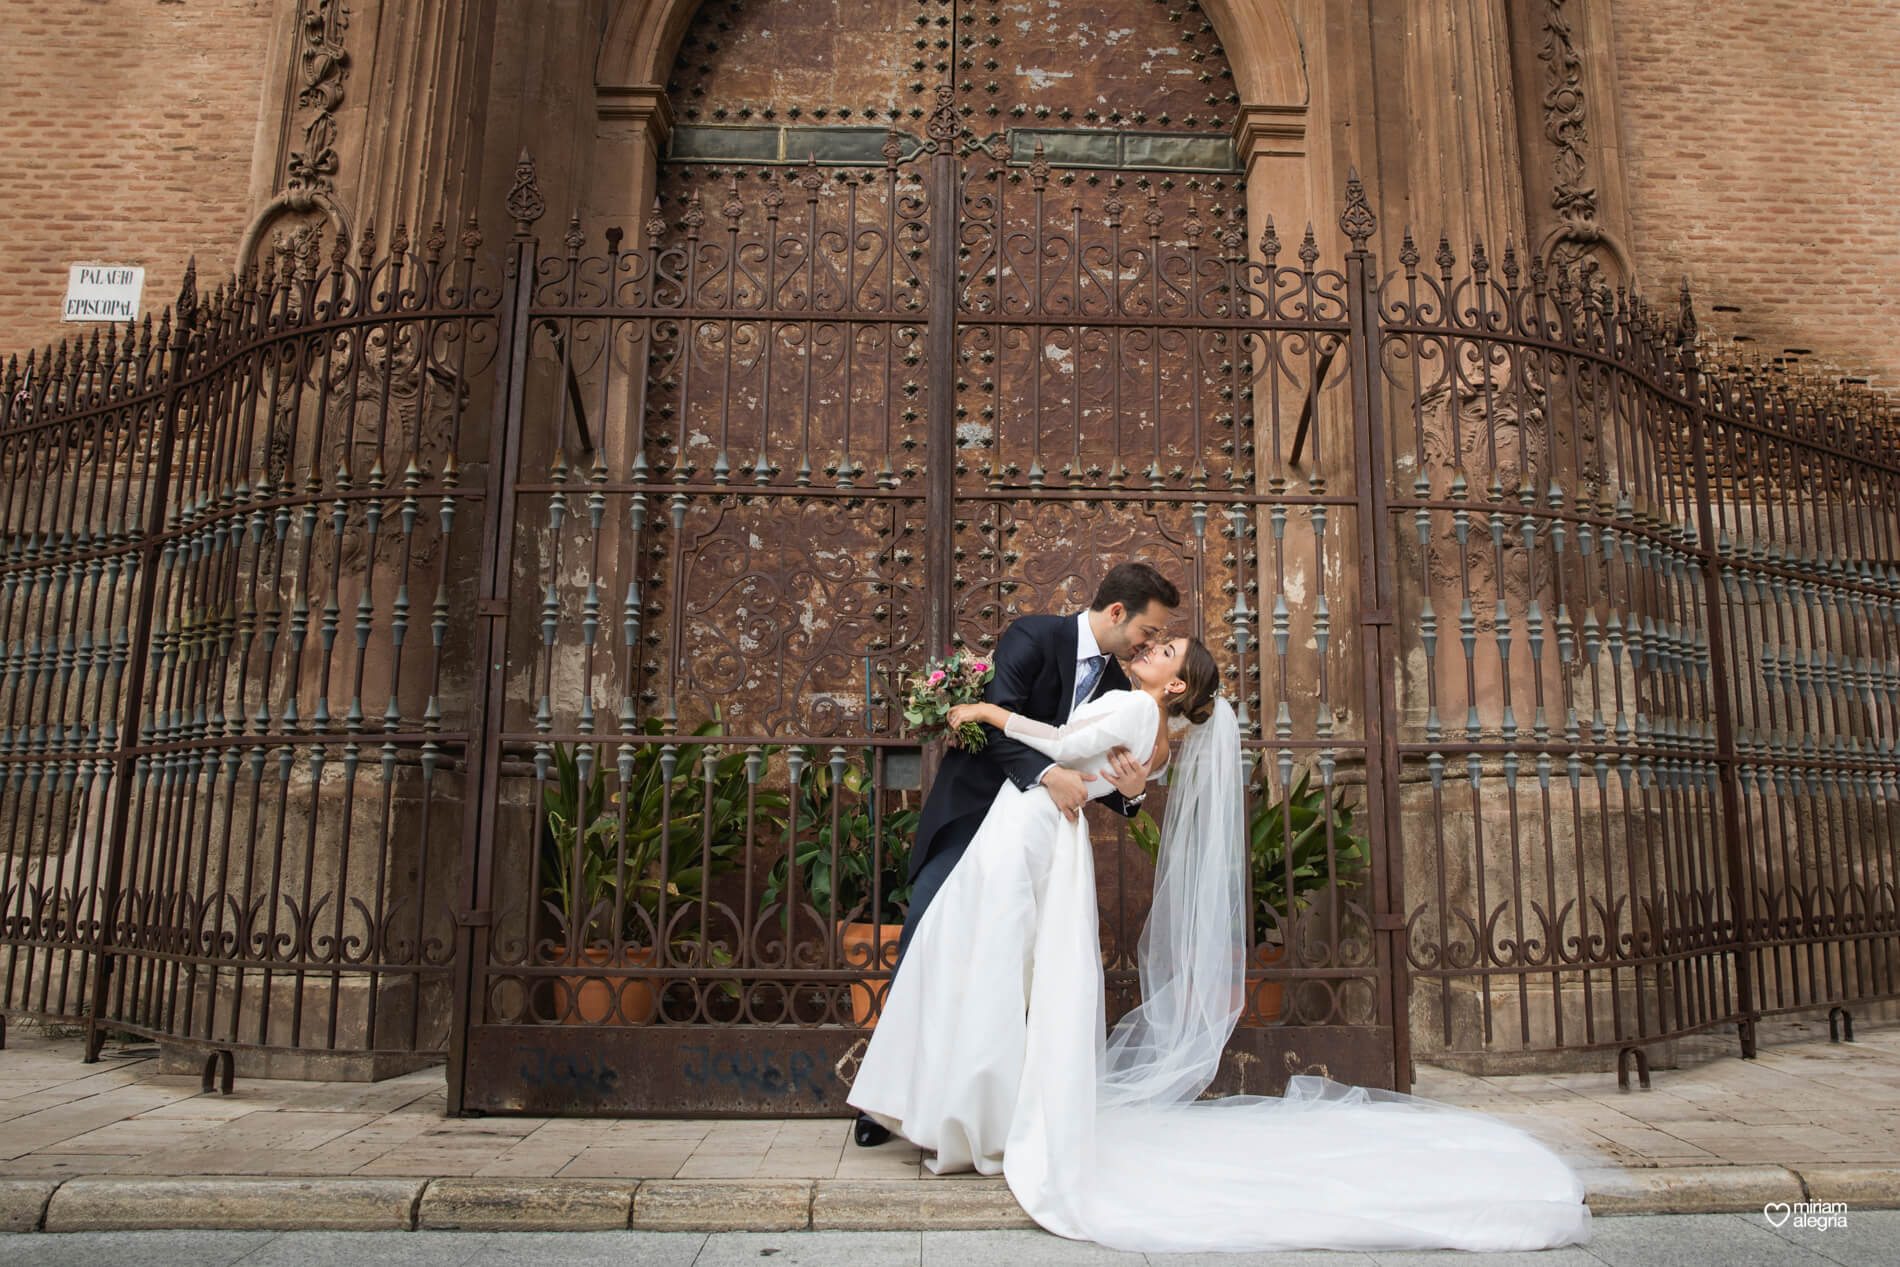 vestido-de-novia-paula-del-vas-miriam-alegria-fotografos-boda-murcia-83